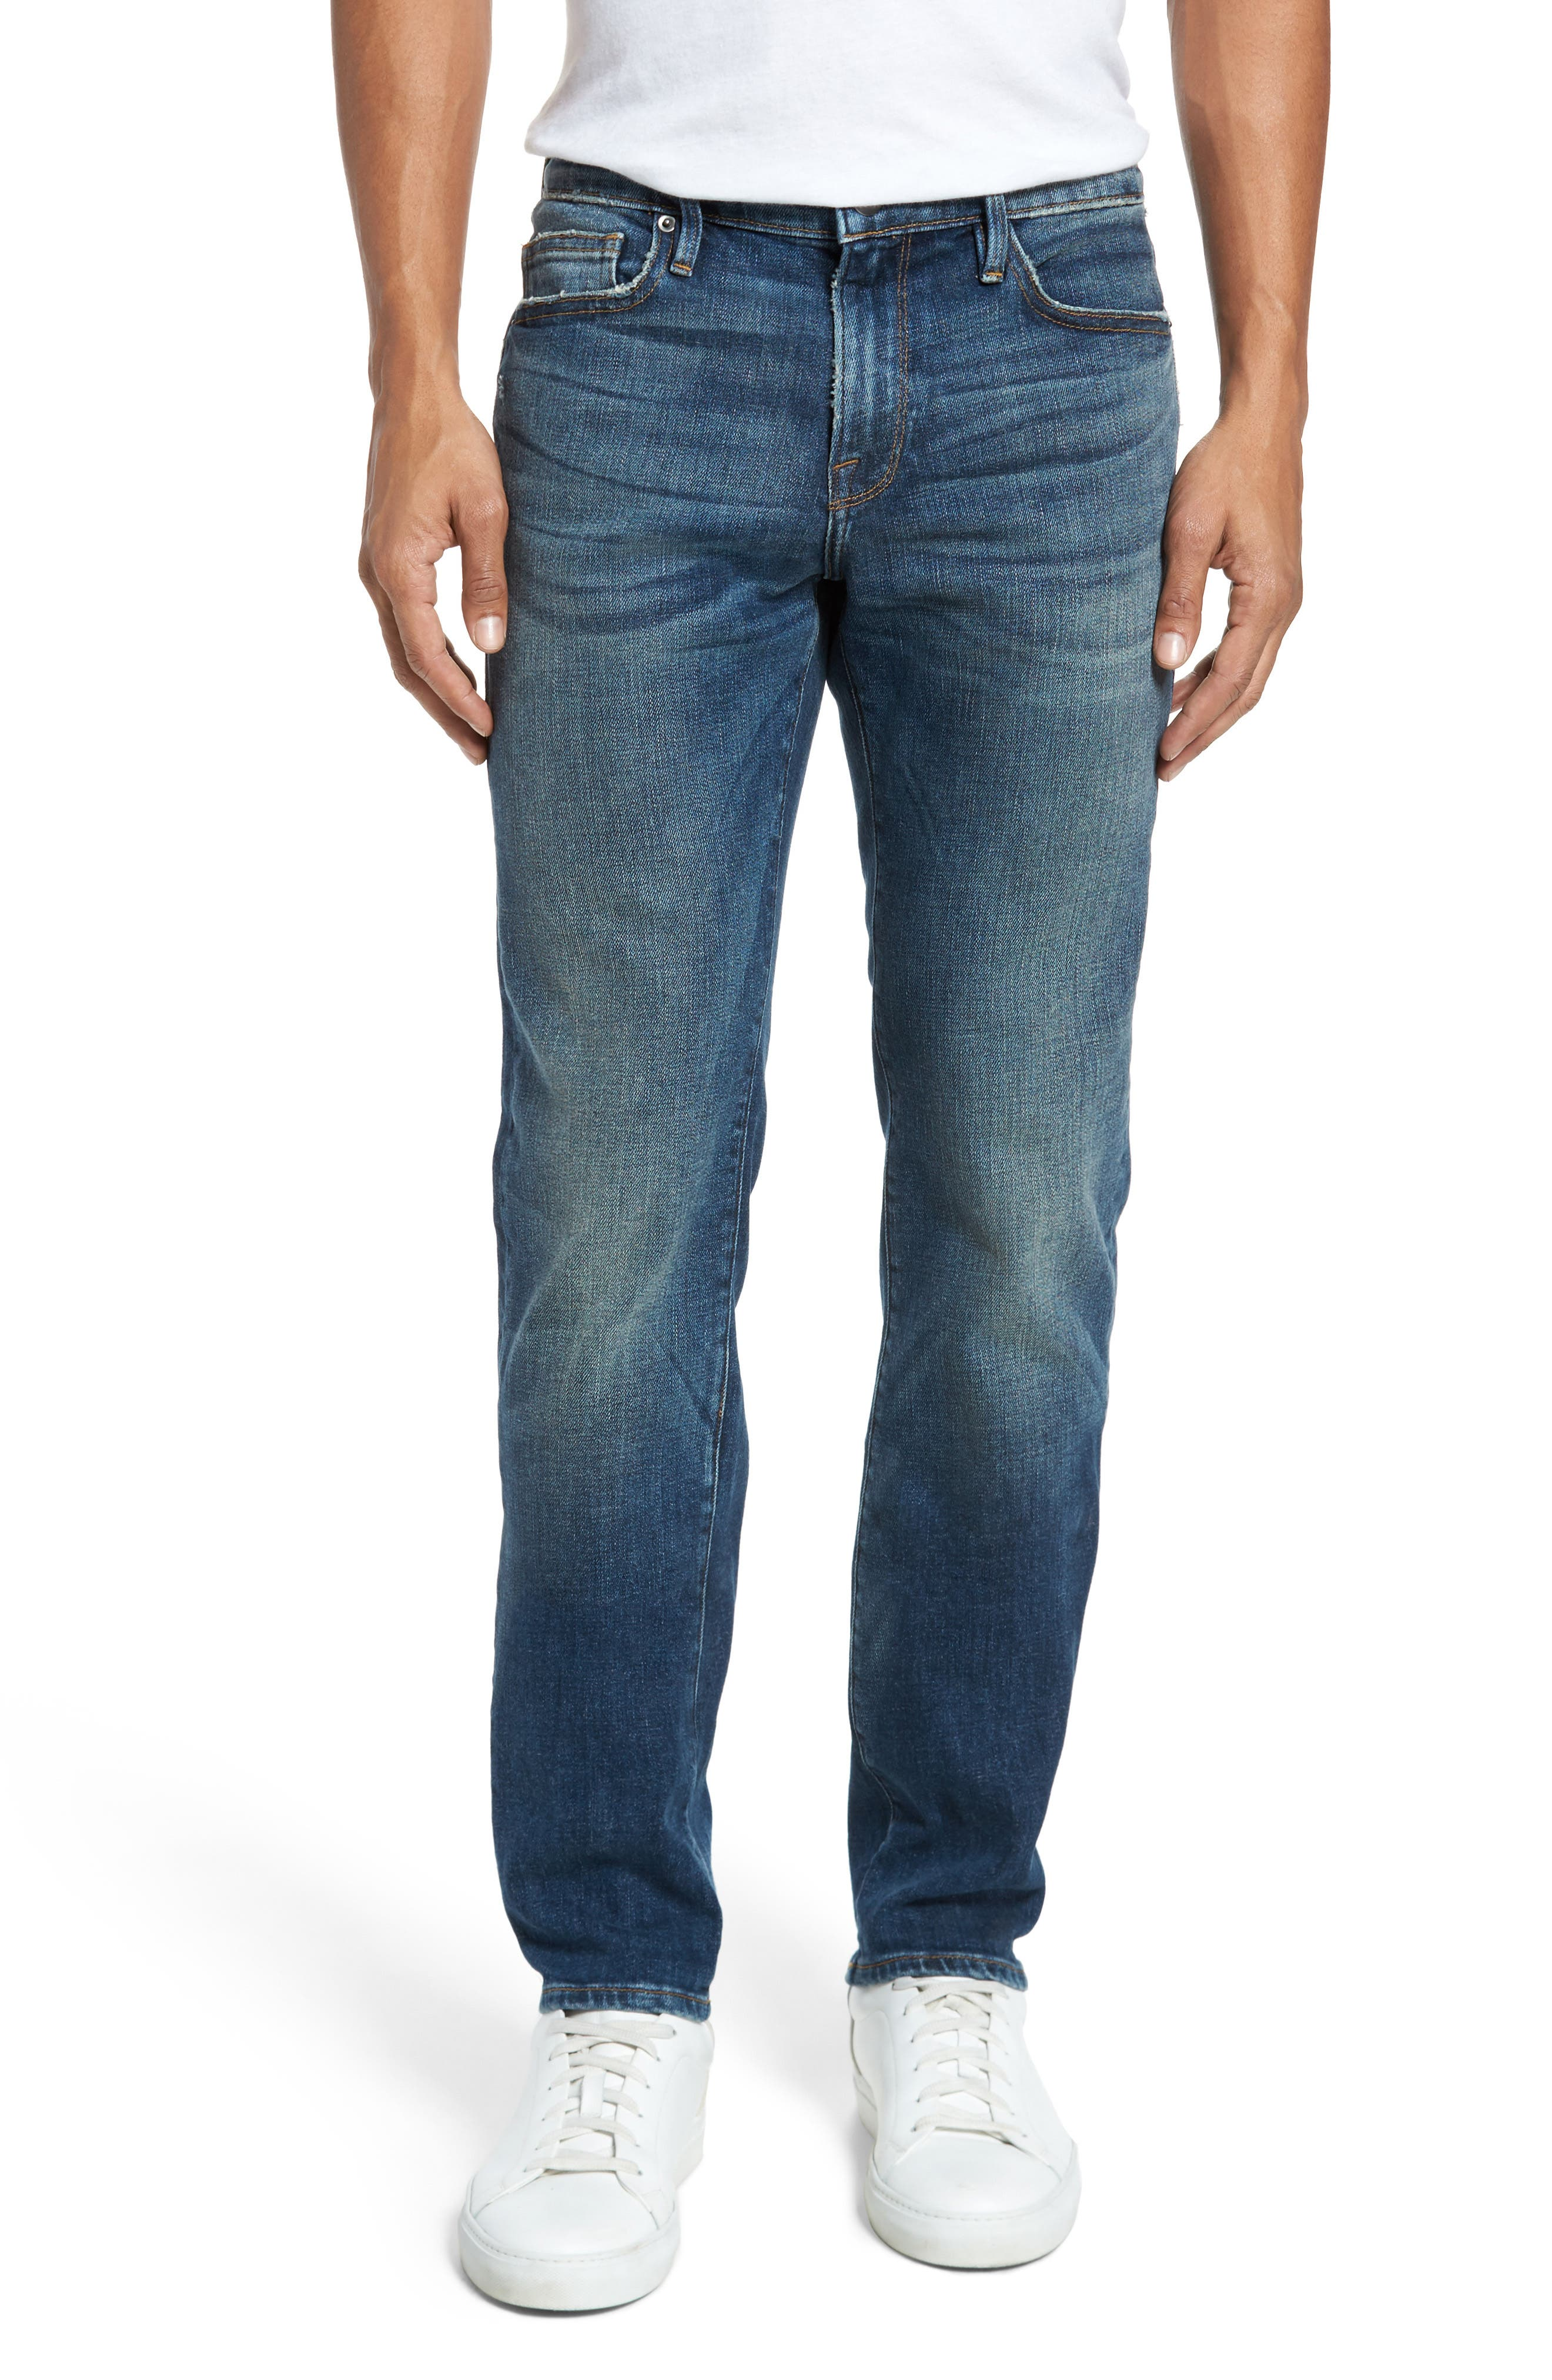 L'Homme Slim Fit Jeans,                         Main,                         color, Salt Lake